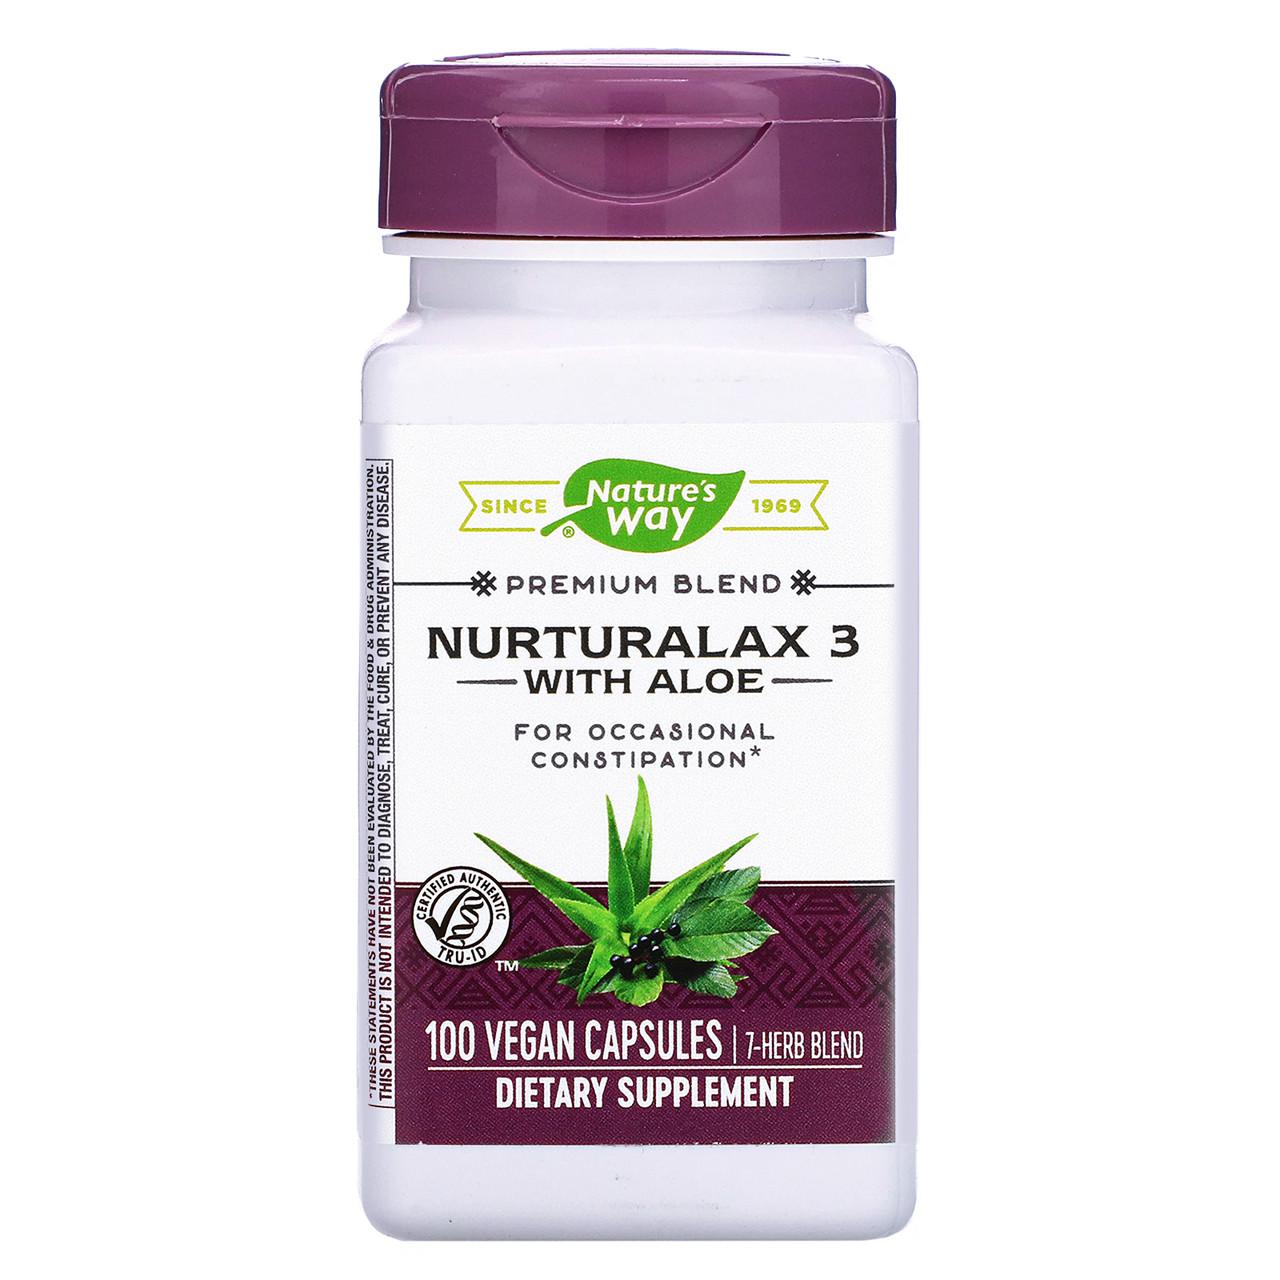 Алое віра (Naturalax3), nature's Way, 430 мг, 100 капсул